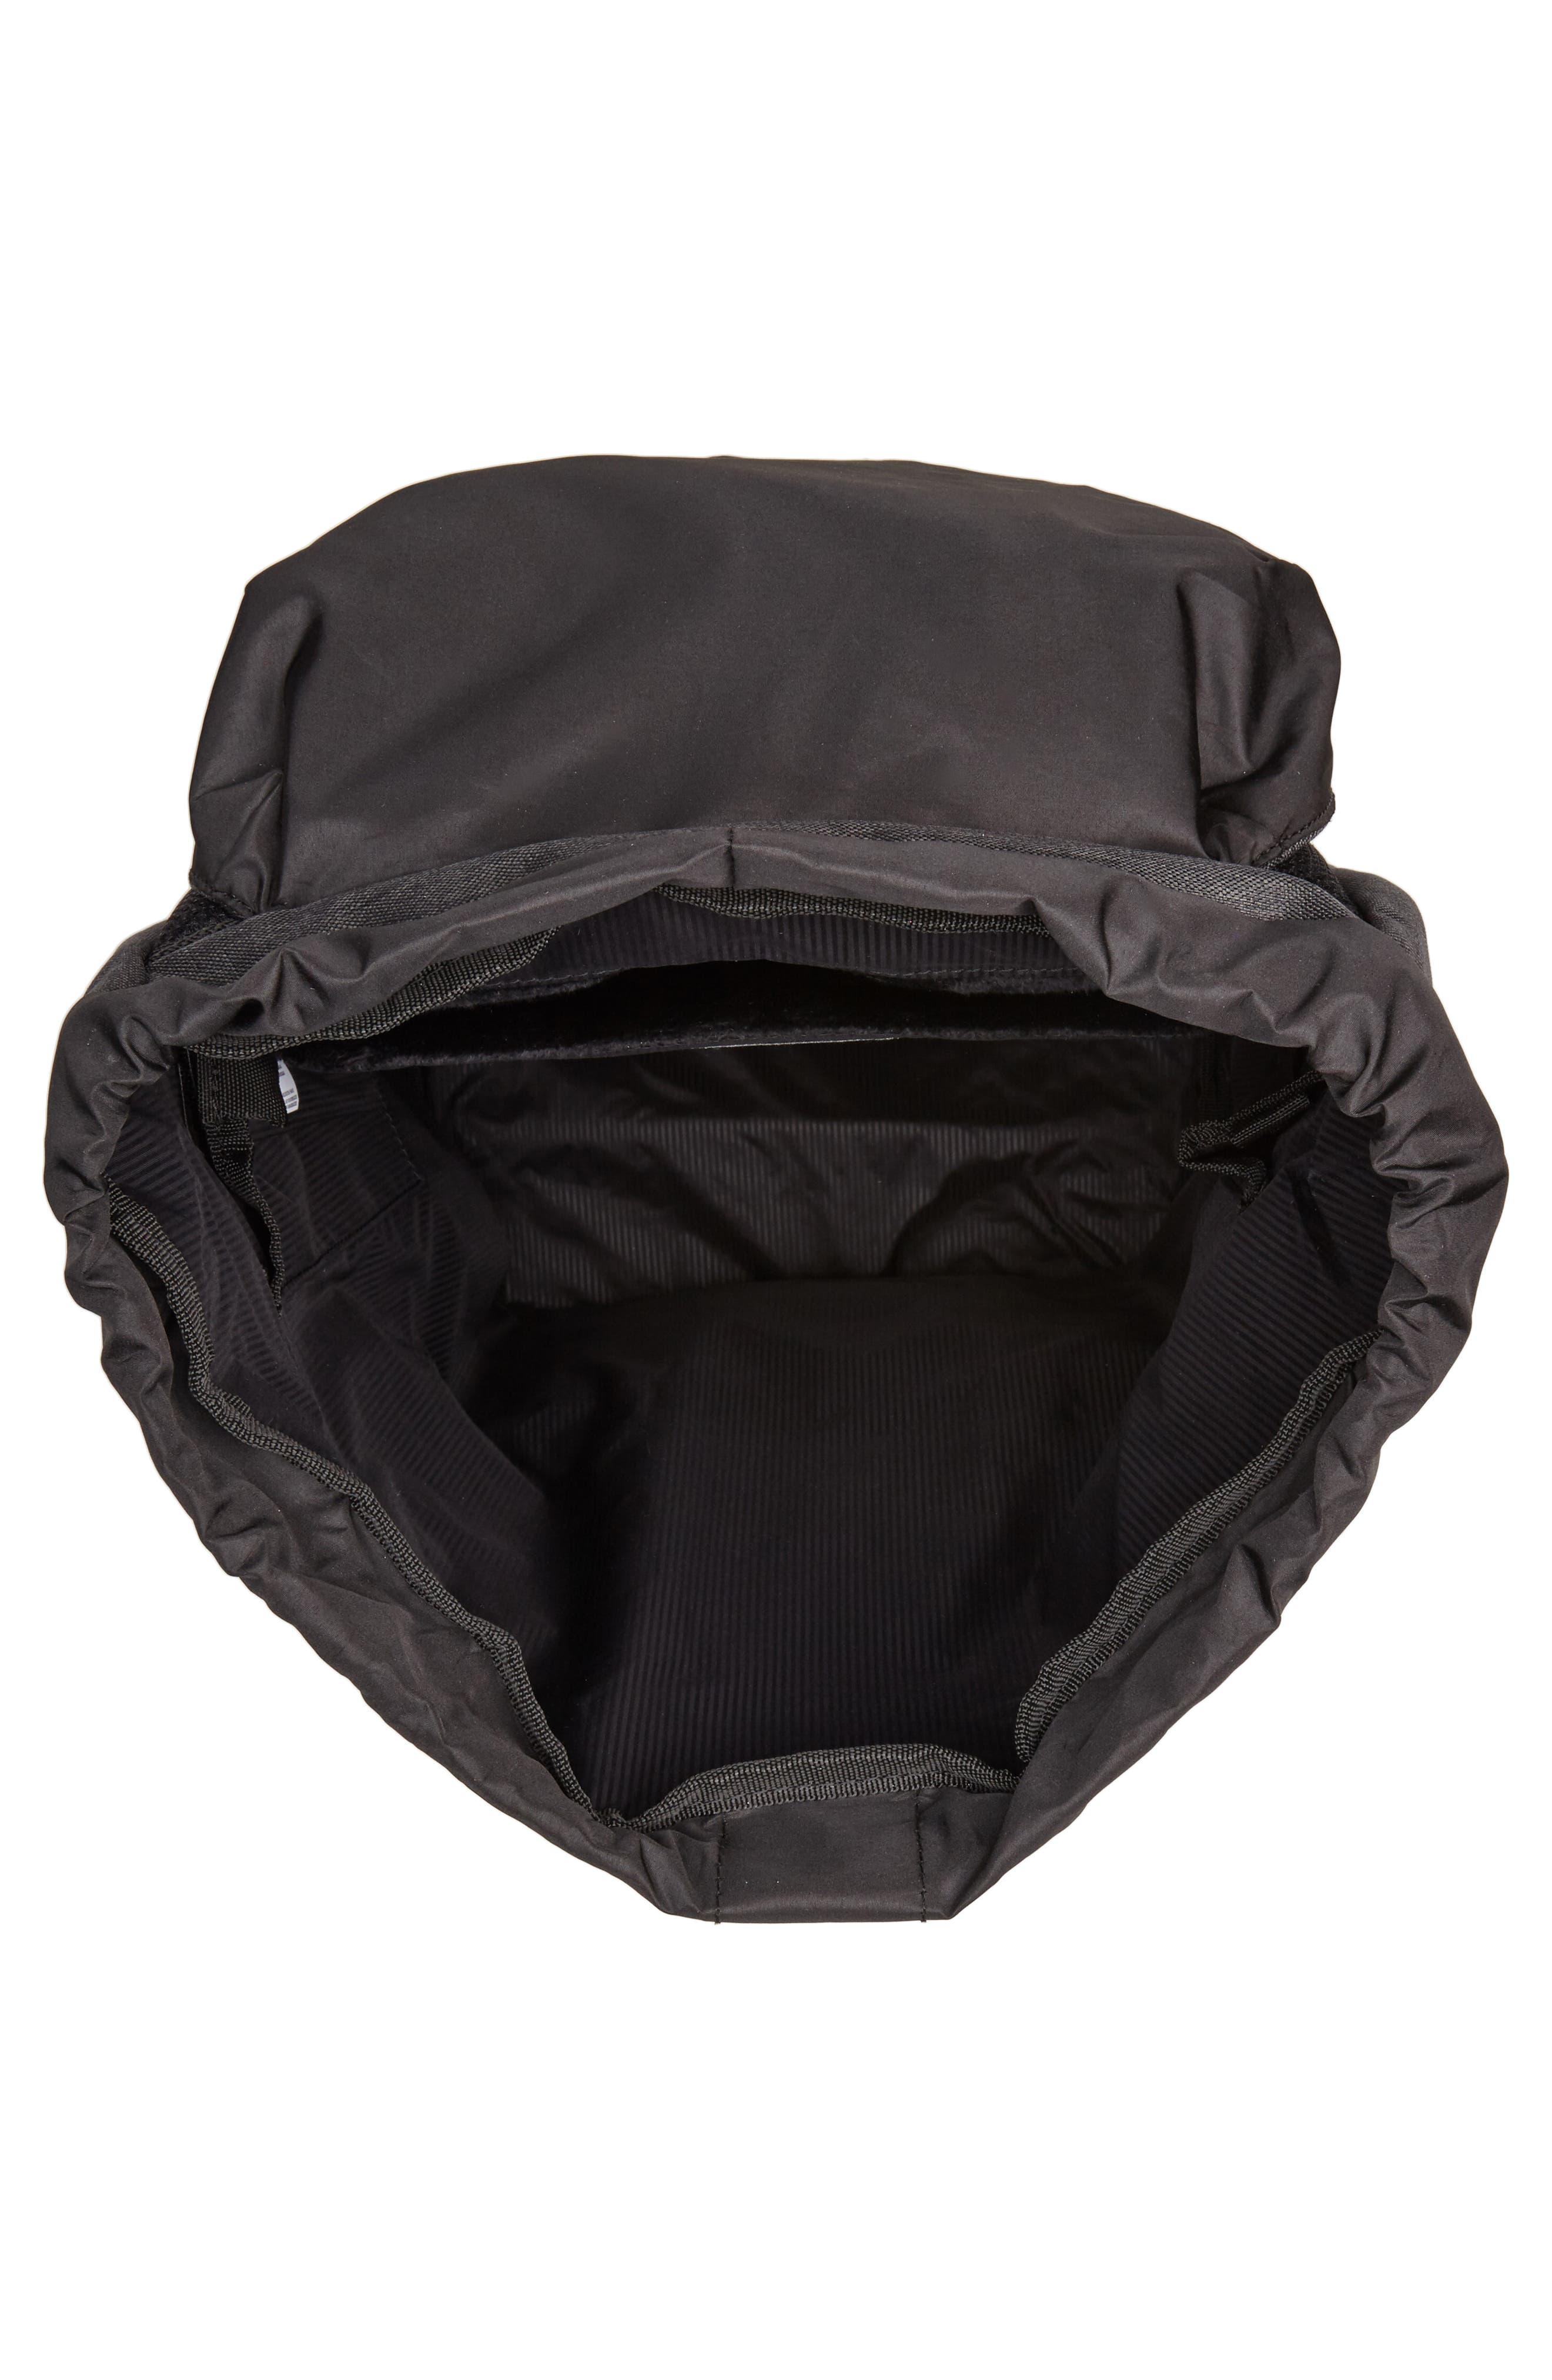 Little America - Reflective Backpack,                             Alternate thumbnail 4, color,                             Black Crosshatch/ Reflective